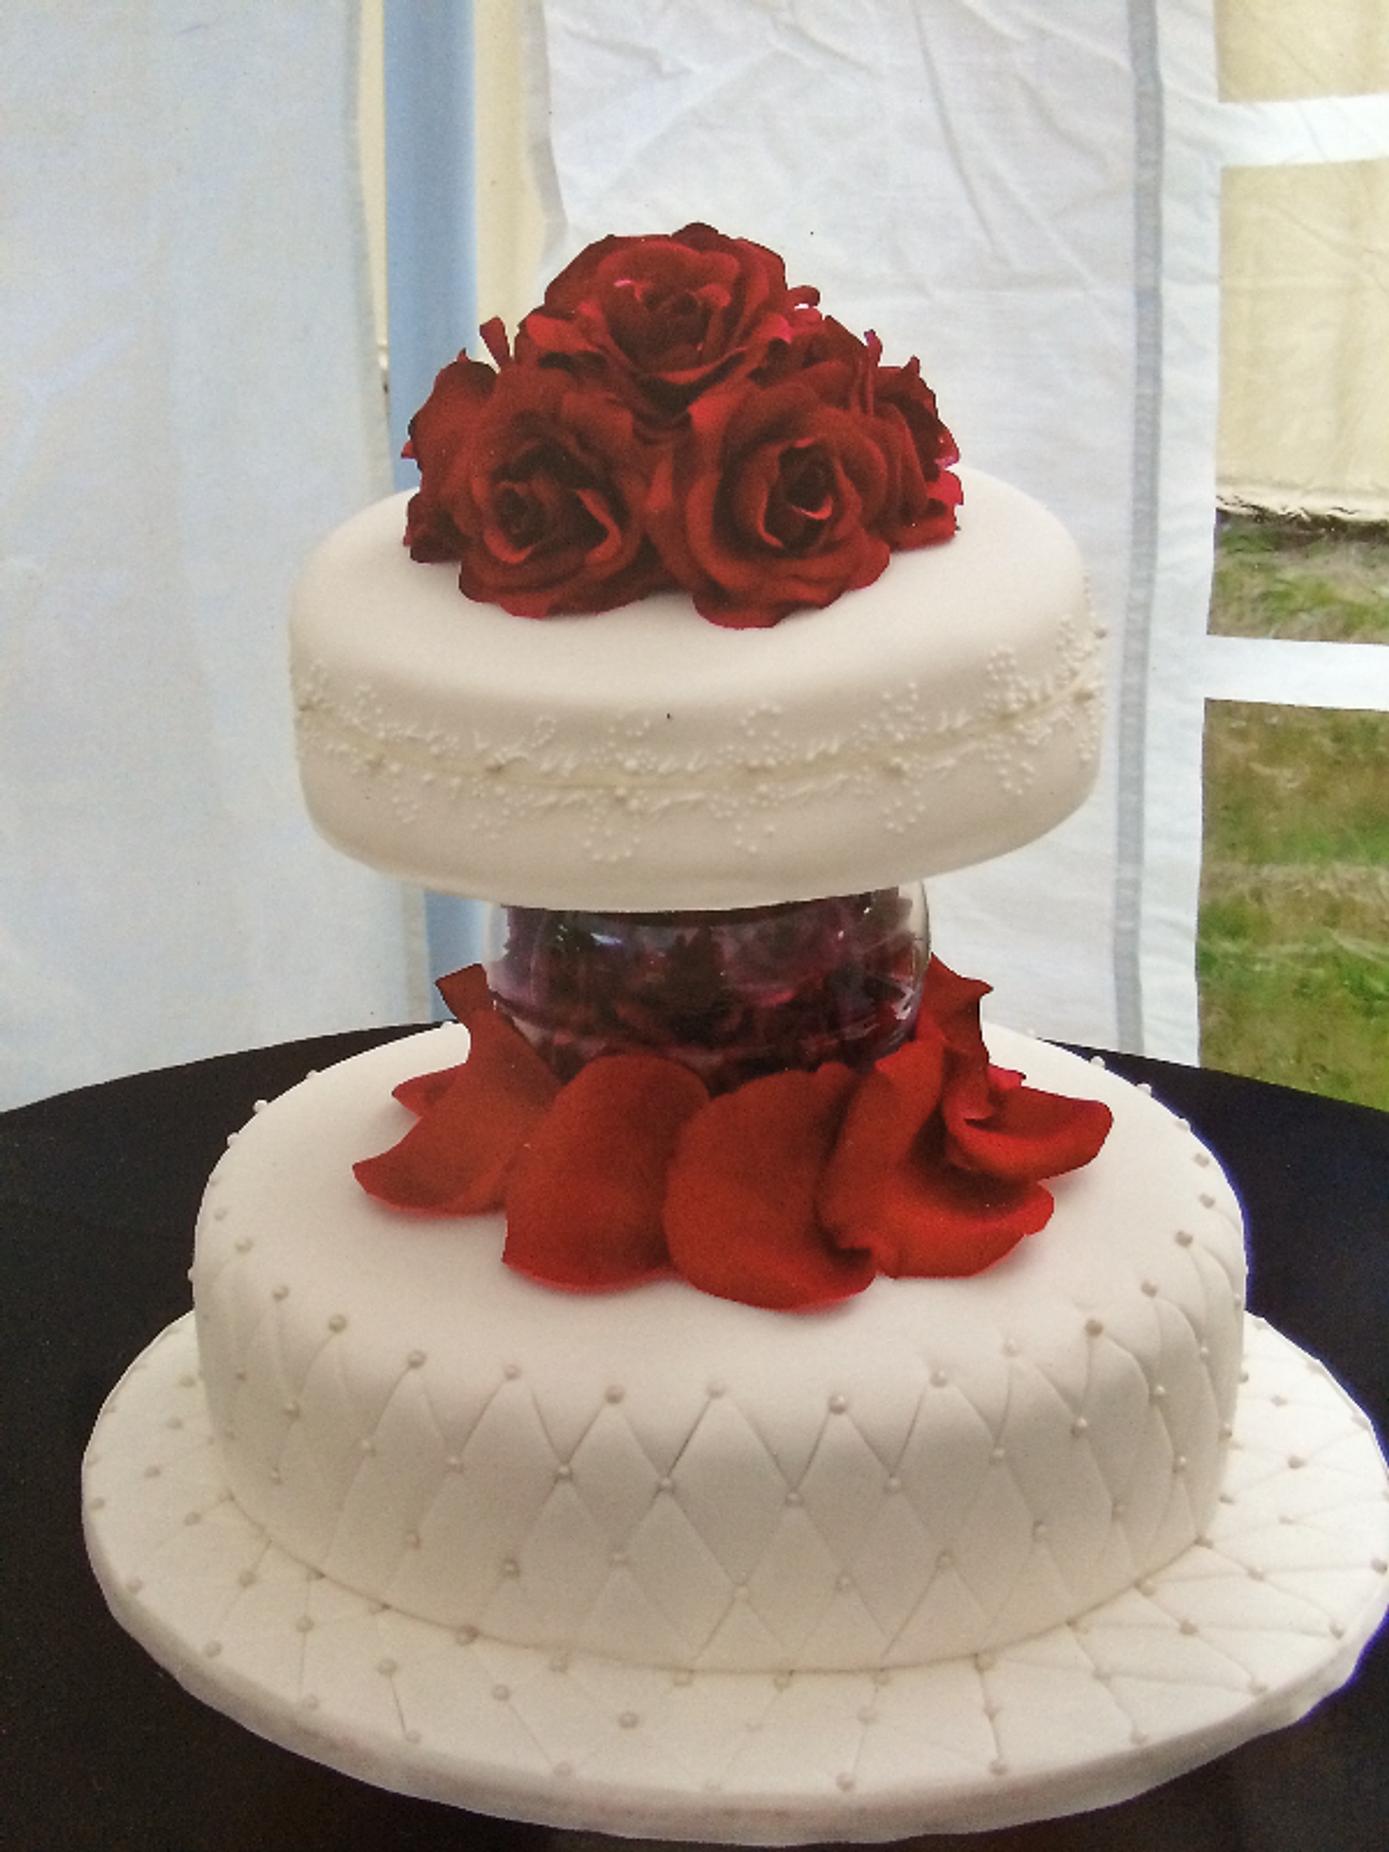 Brisbane wedding cake and flowers